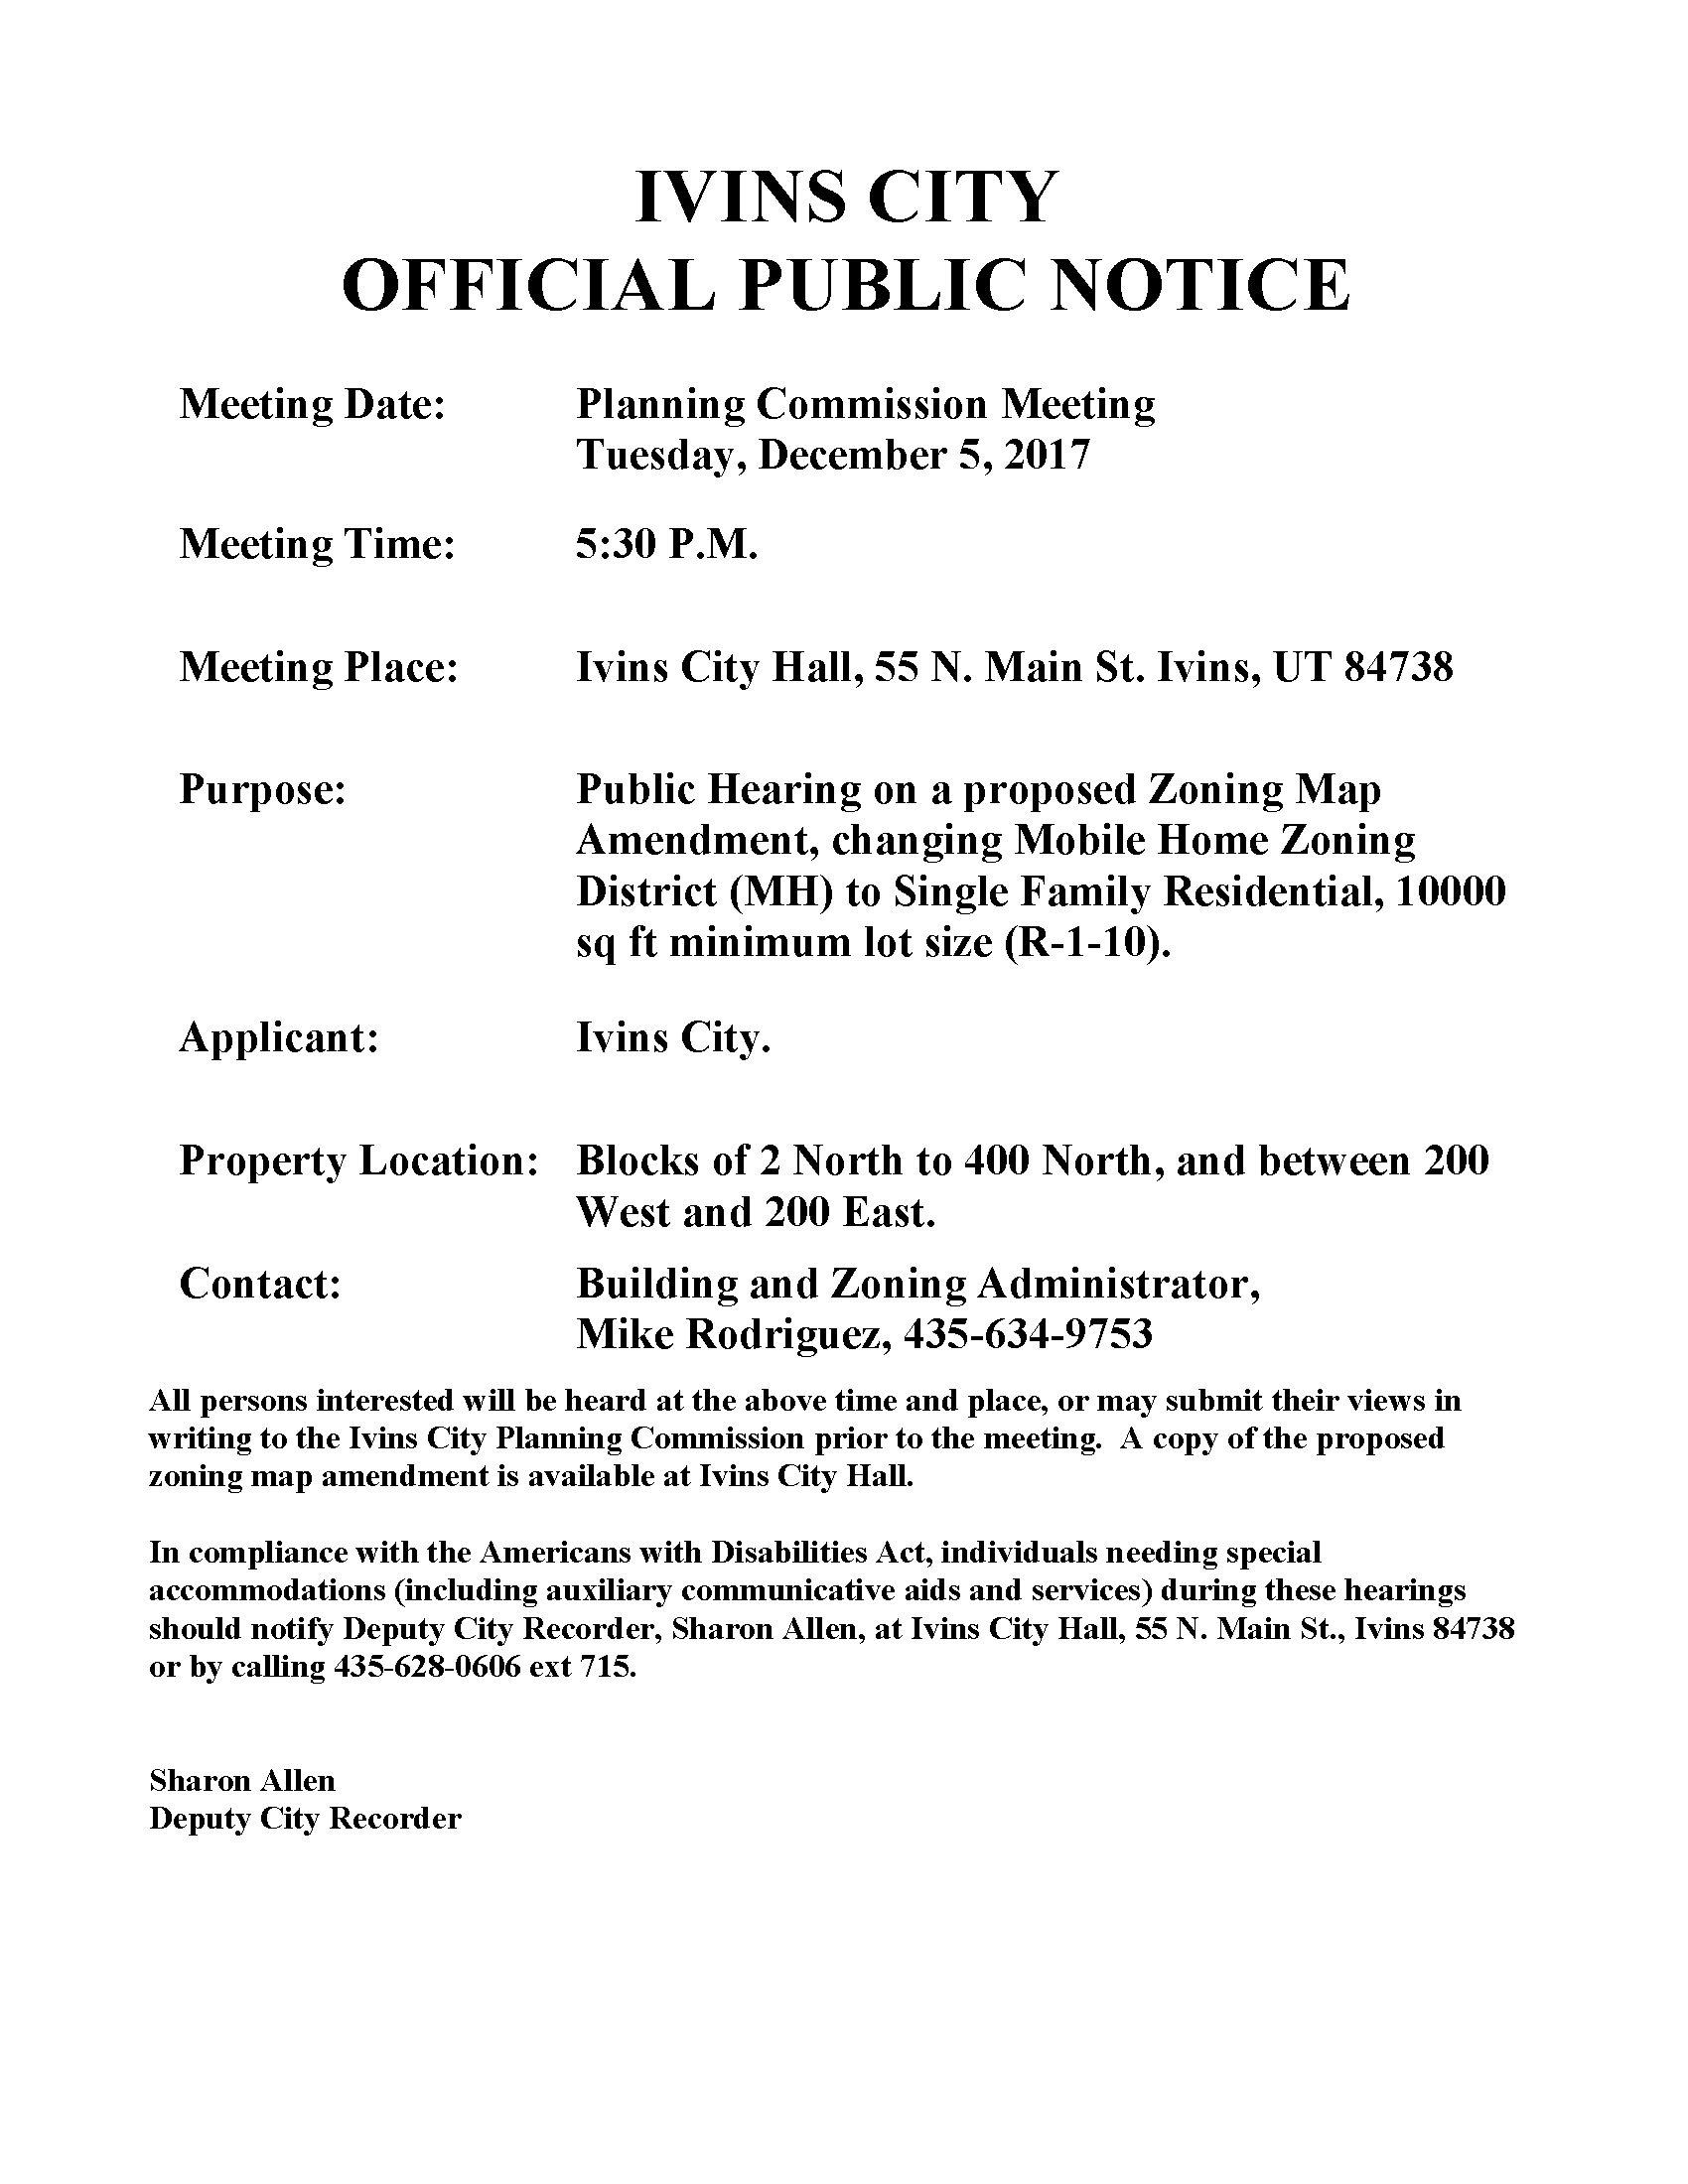 Public Hearings   Ivins City